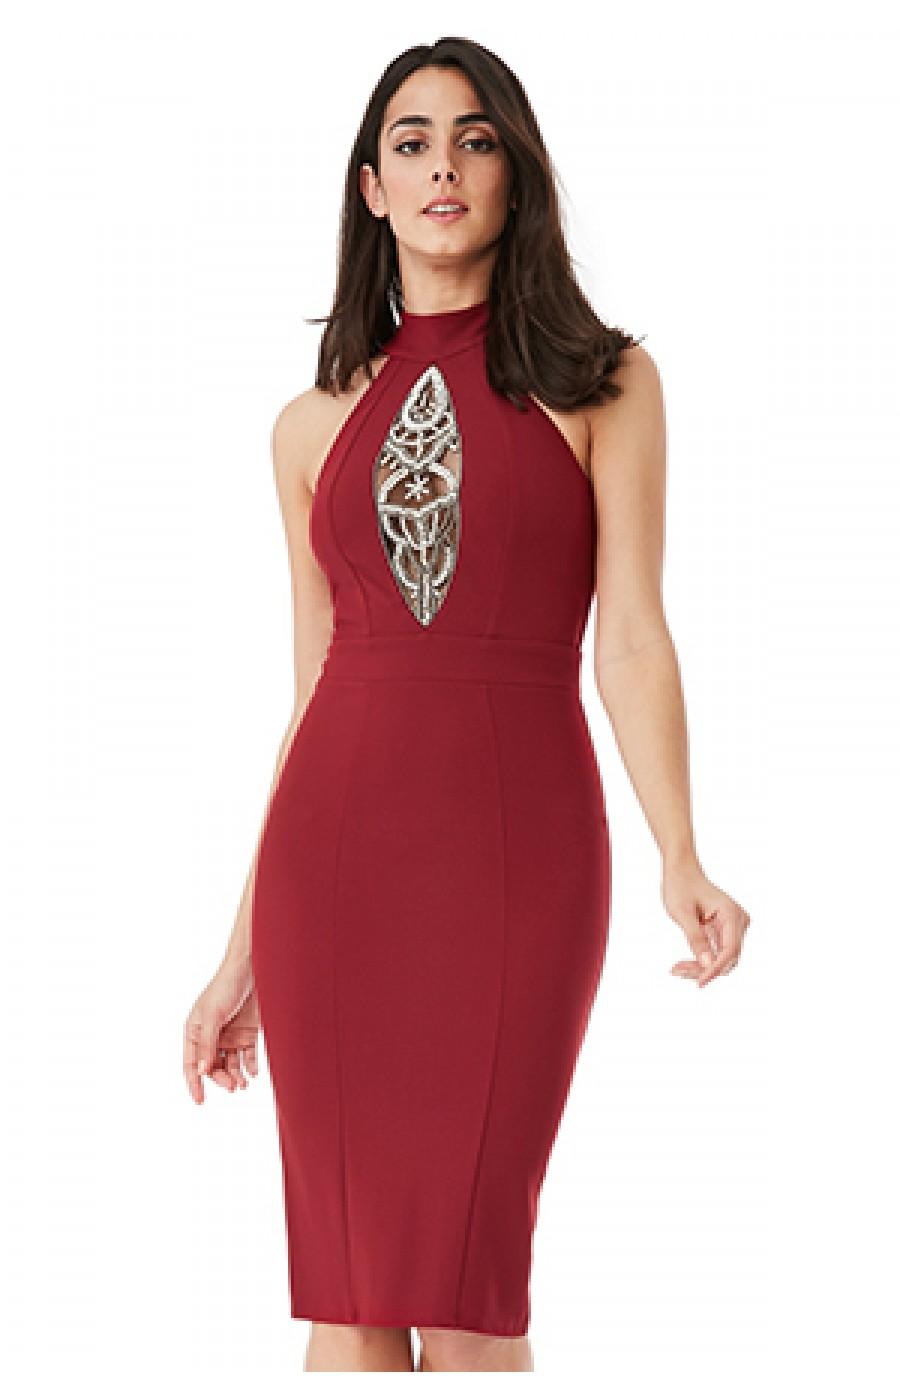 dc3165463e07 Μίντι μπορντω φόρεμα με κεντημα και διαφάνεια μπροστά